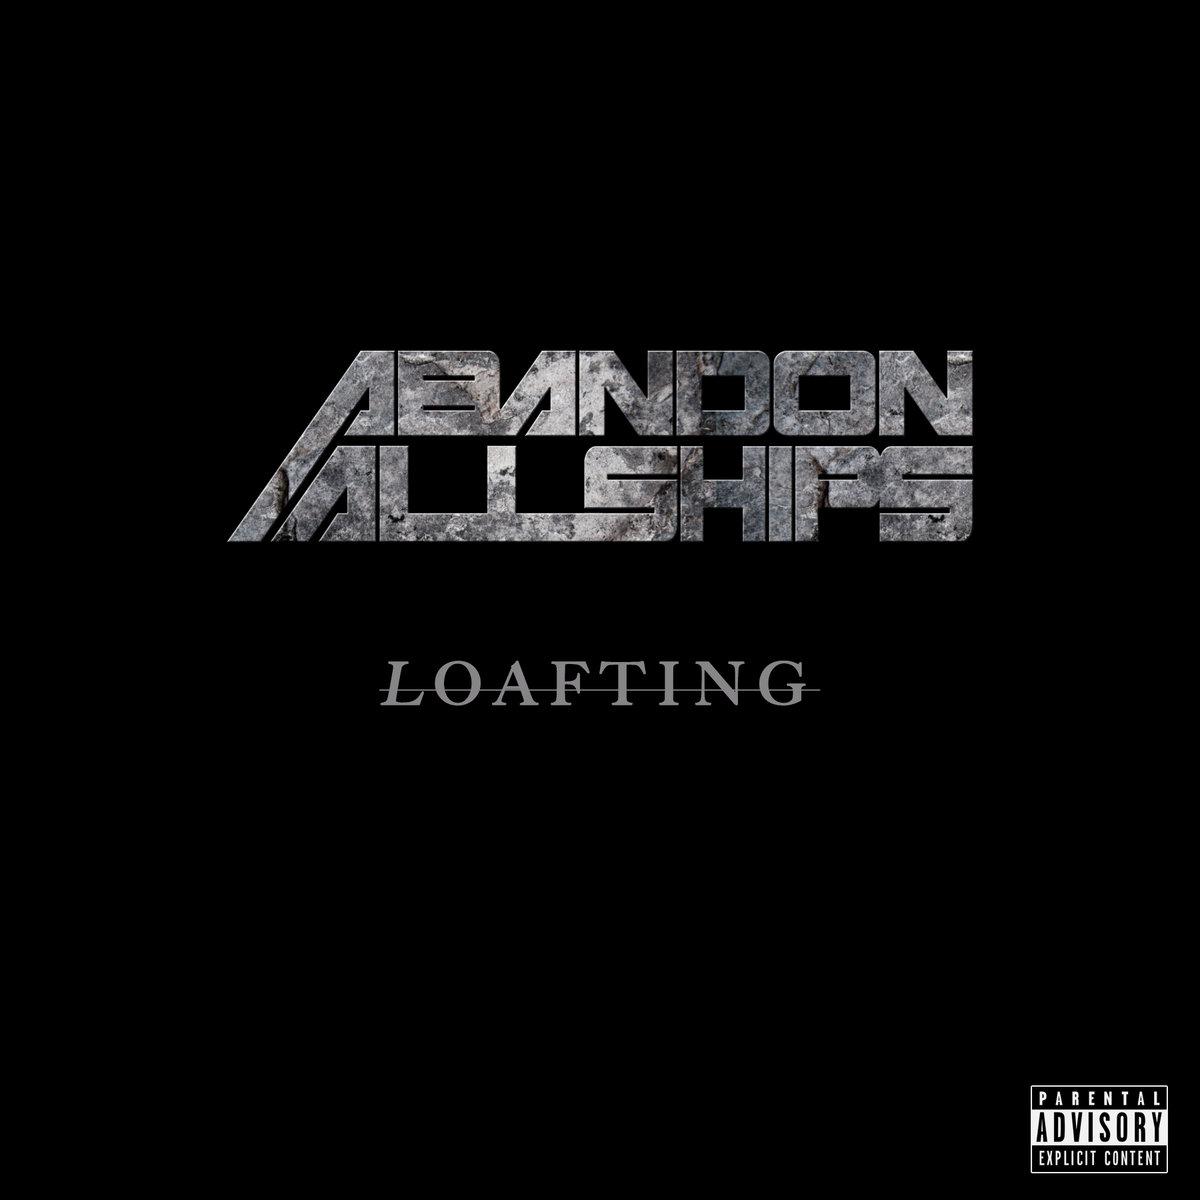 Abandon All Ships - Loafting [single] (2016)